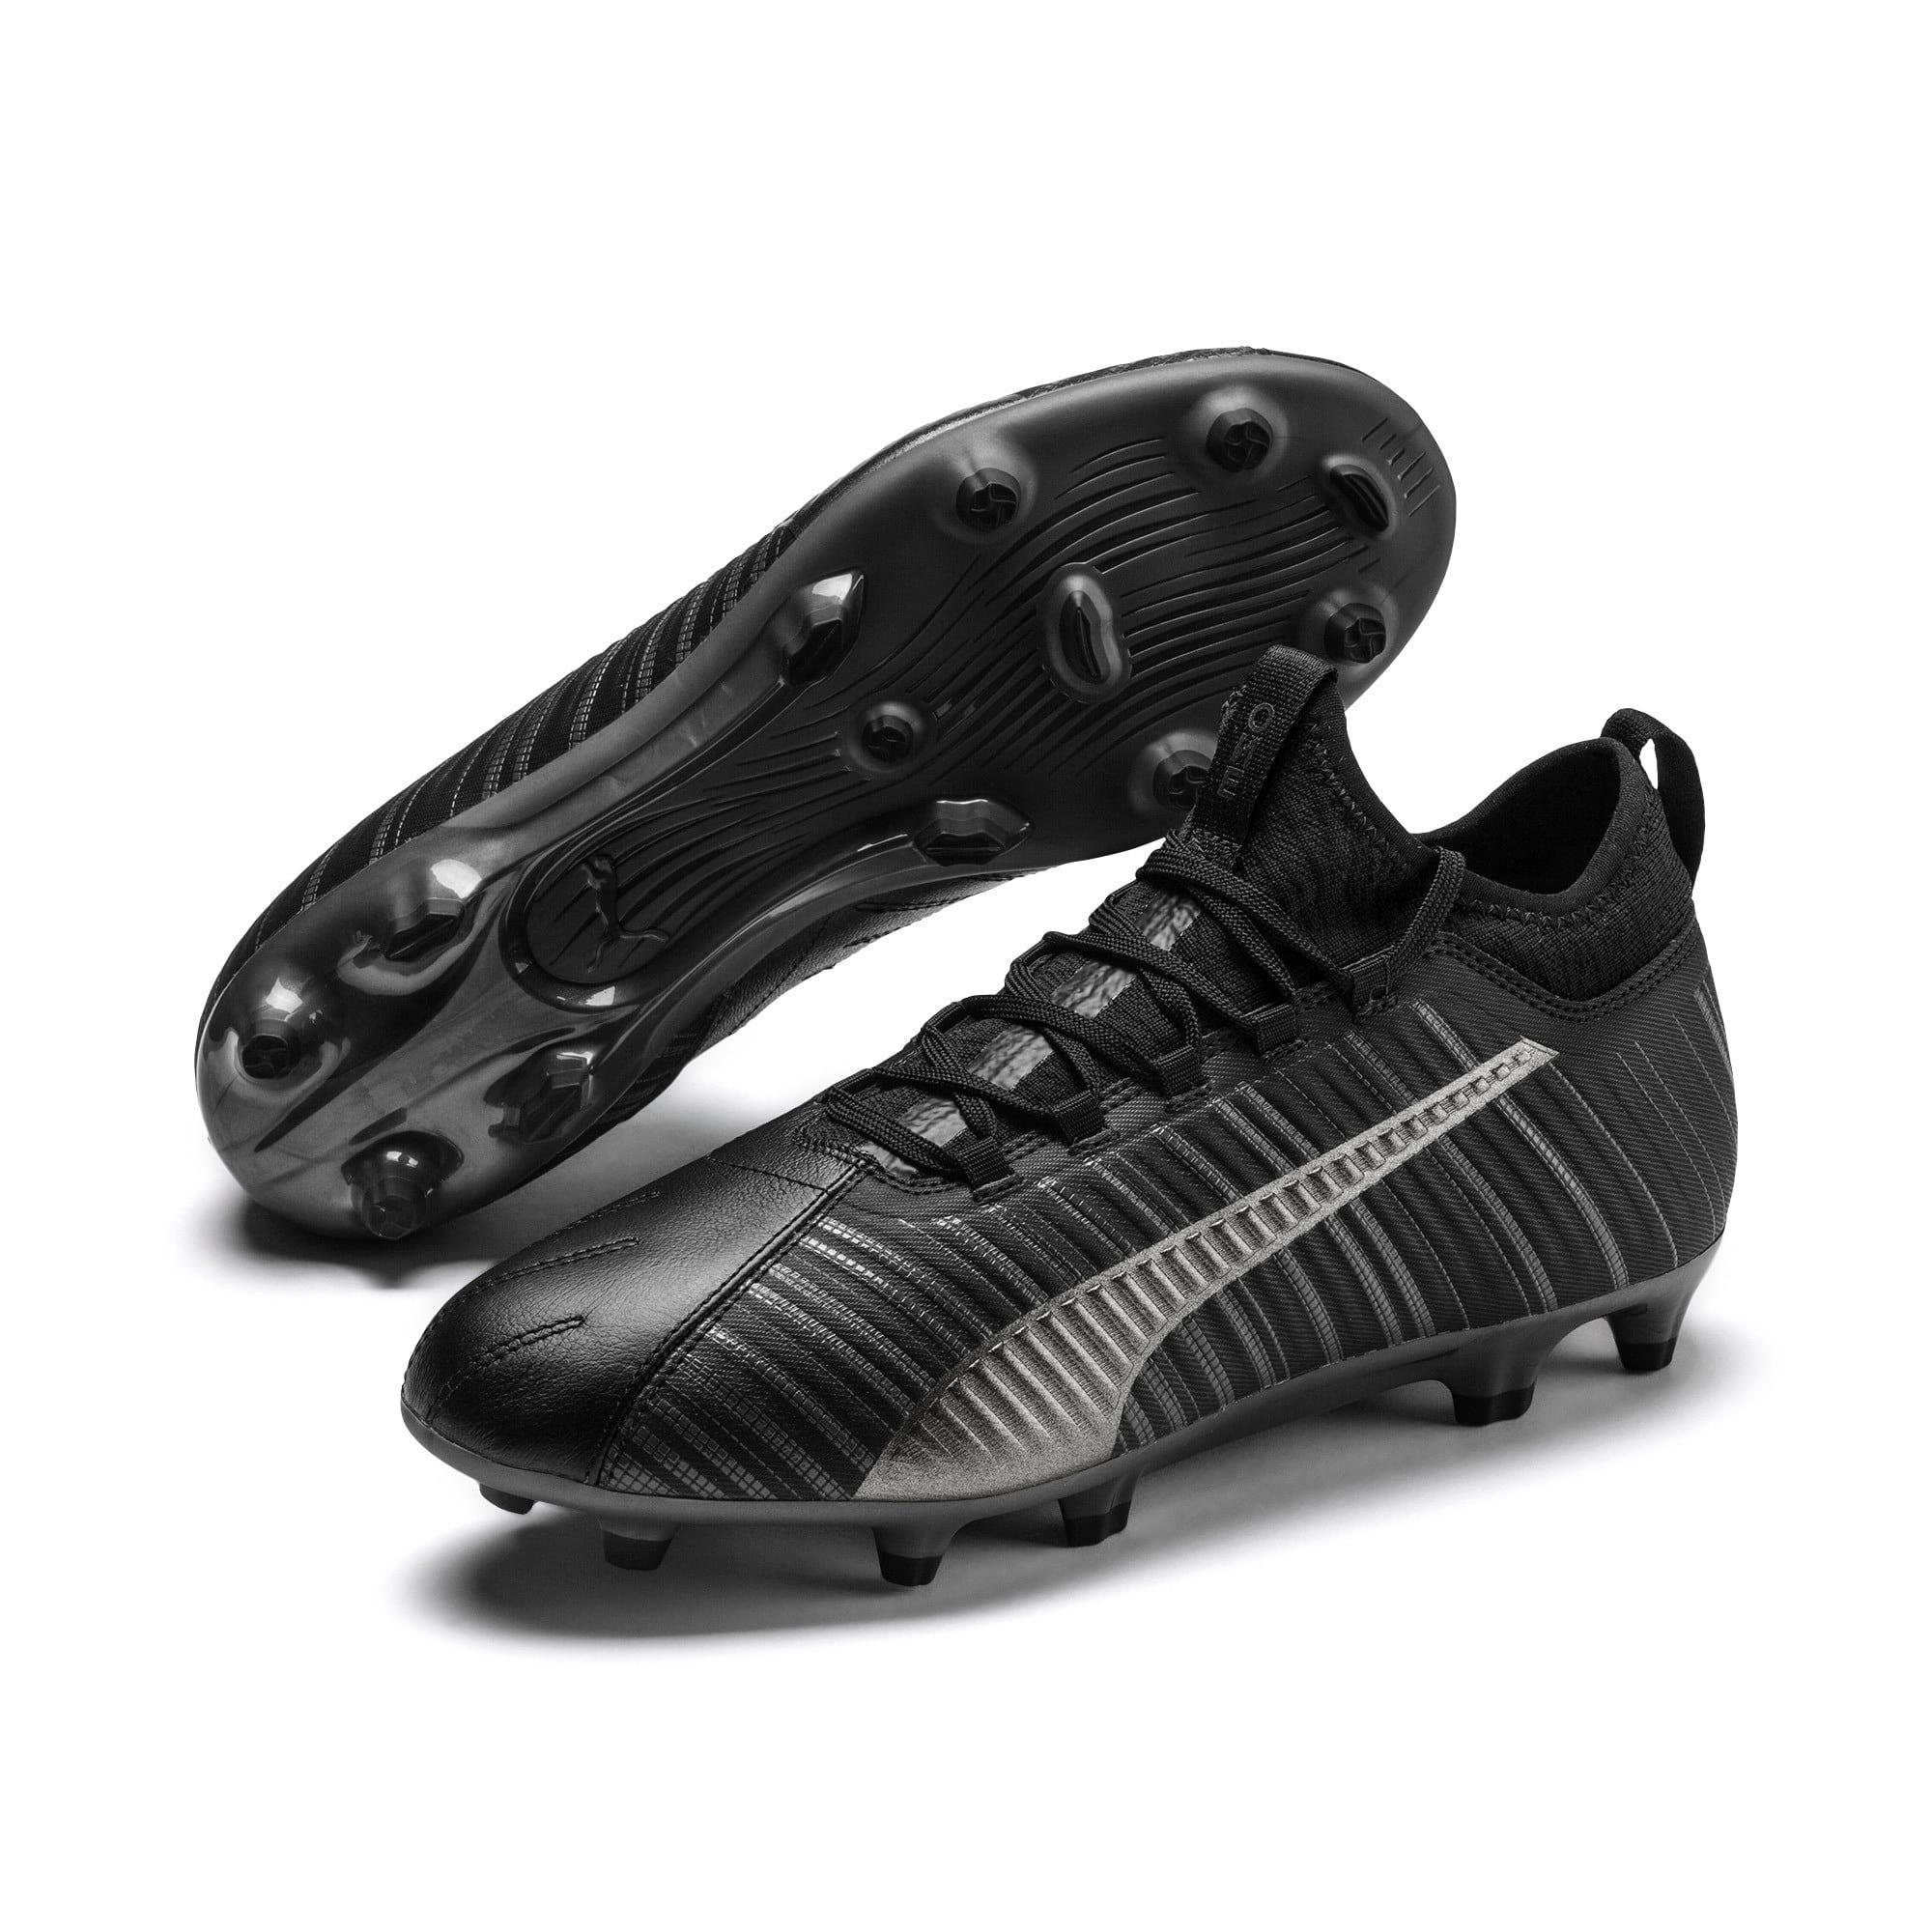 Thumbnail 3 of PUMA ONE 5.3 FG/AG Men's Soccer Cleats, Black-Black-Puma Aged Silver, medium